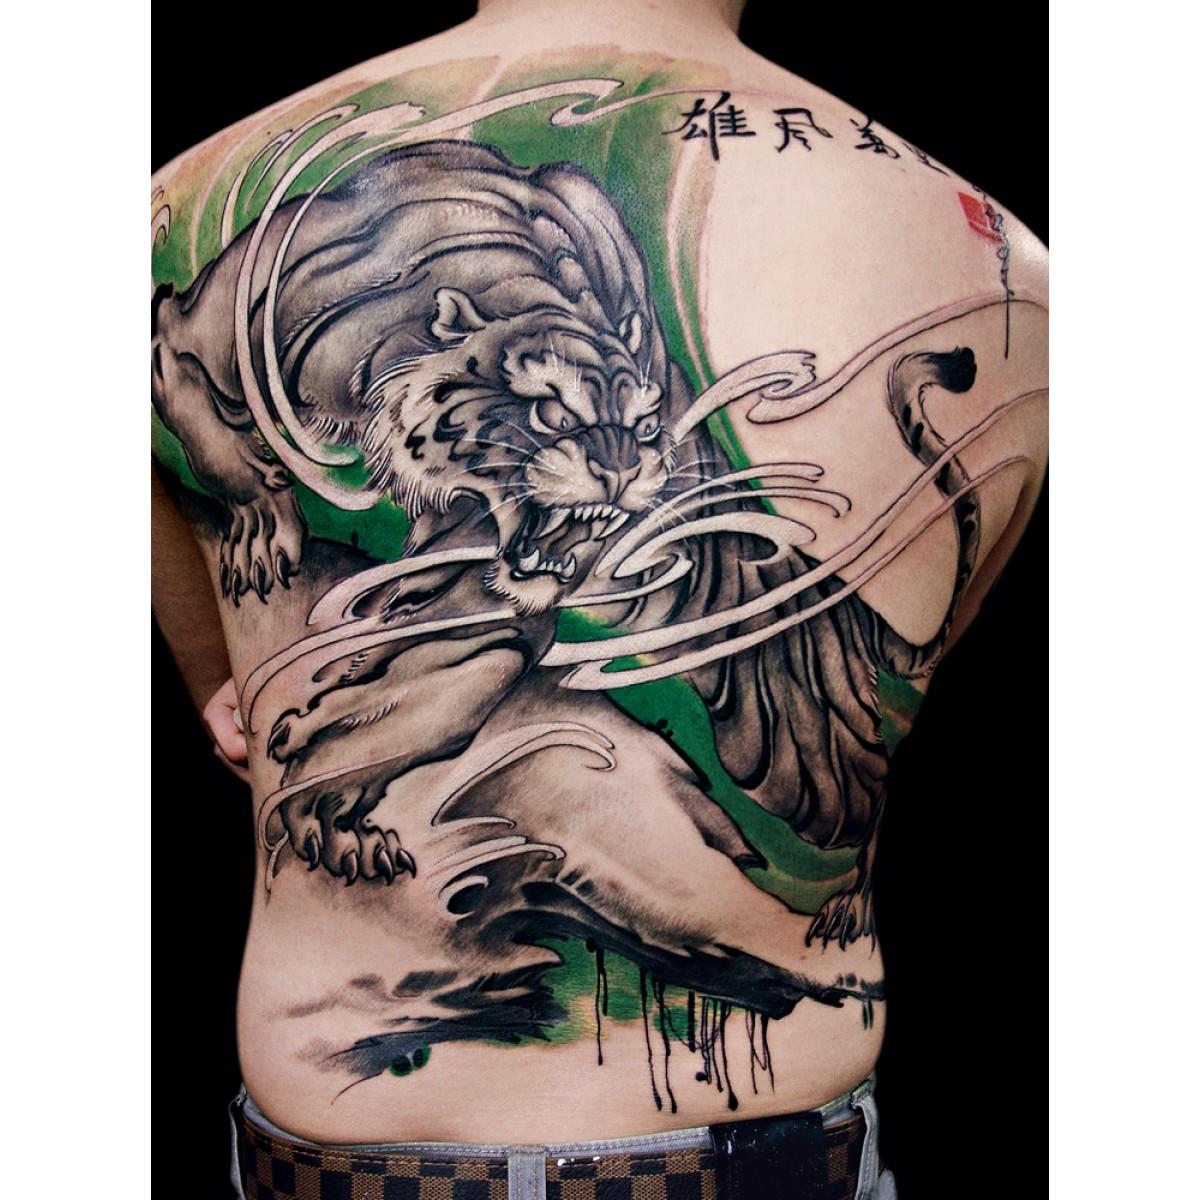 Tato Art Styles: CHINESE TATTOO ART